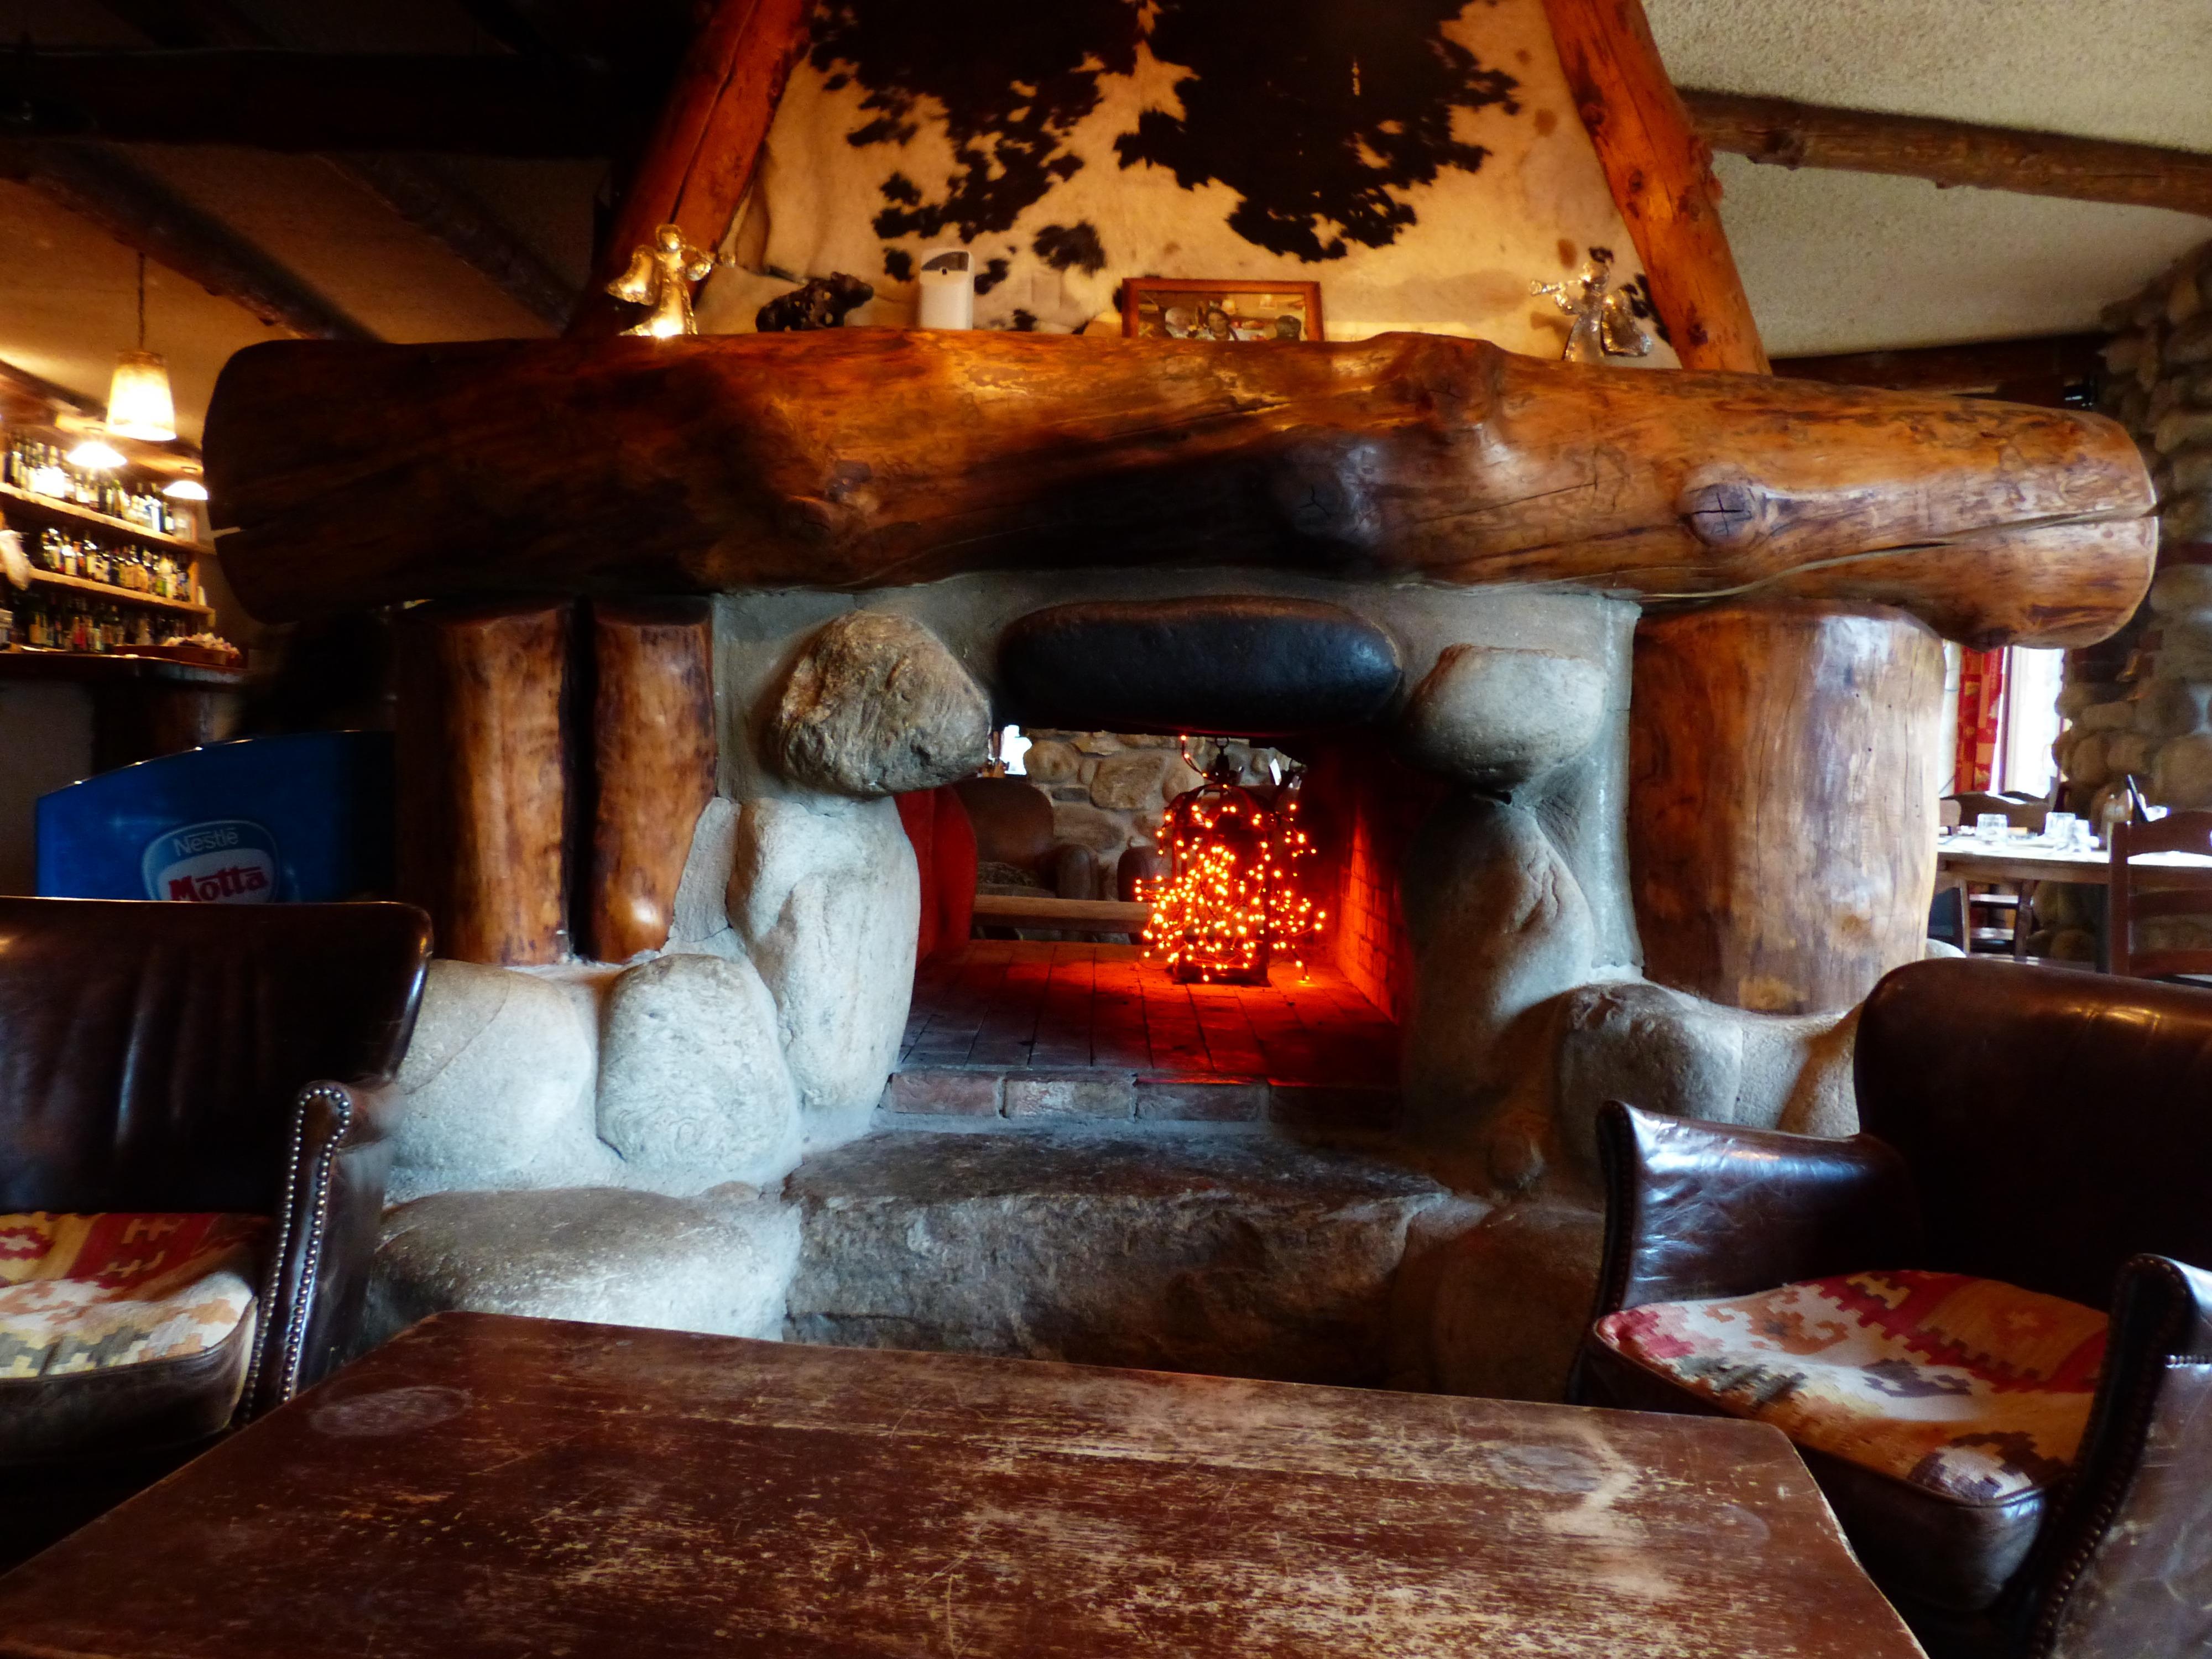 Kostenlose foto : Holz, warm, Haus, Zuhause, rustikal, Hütte ...